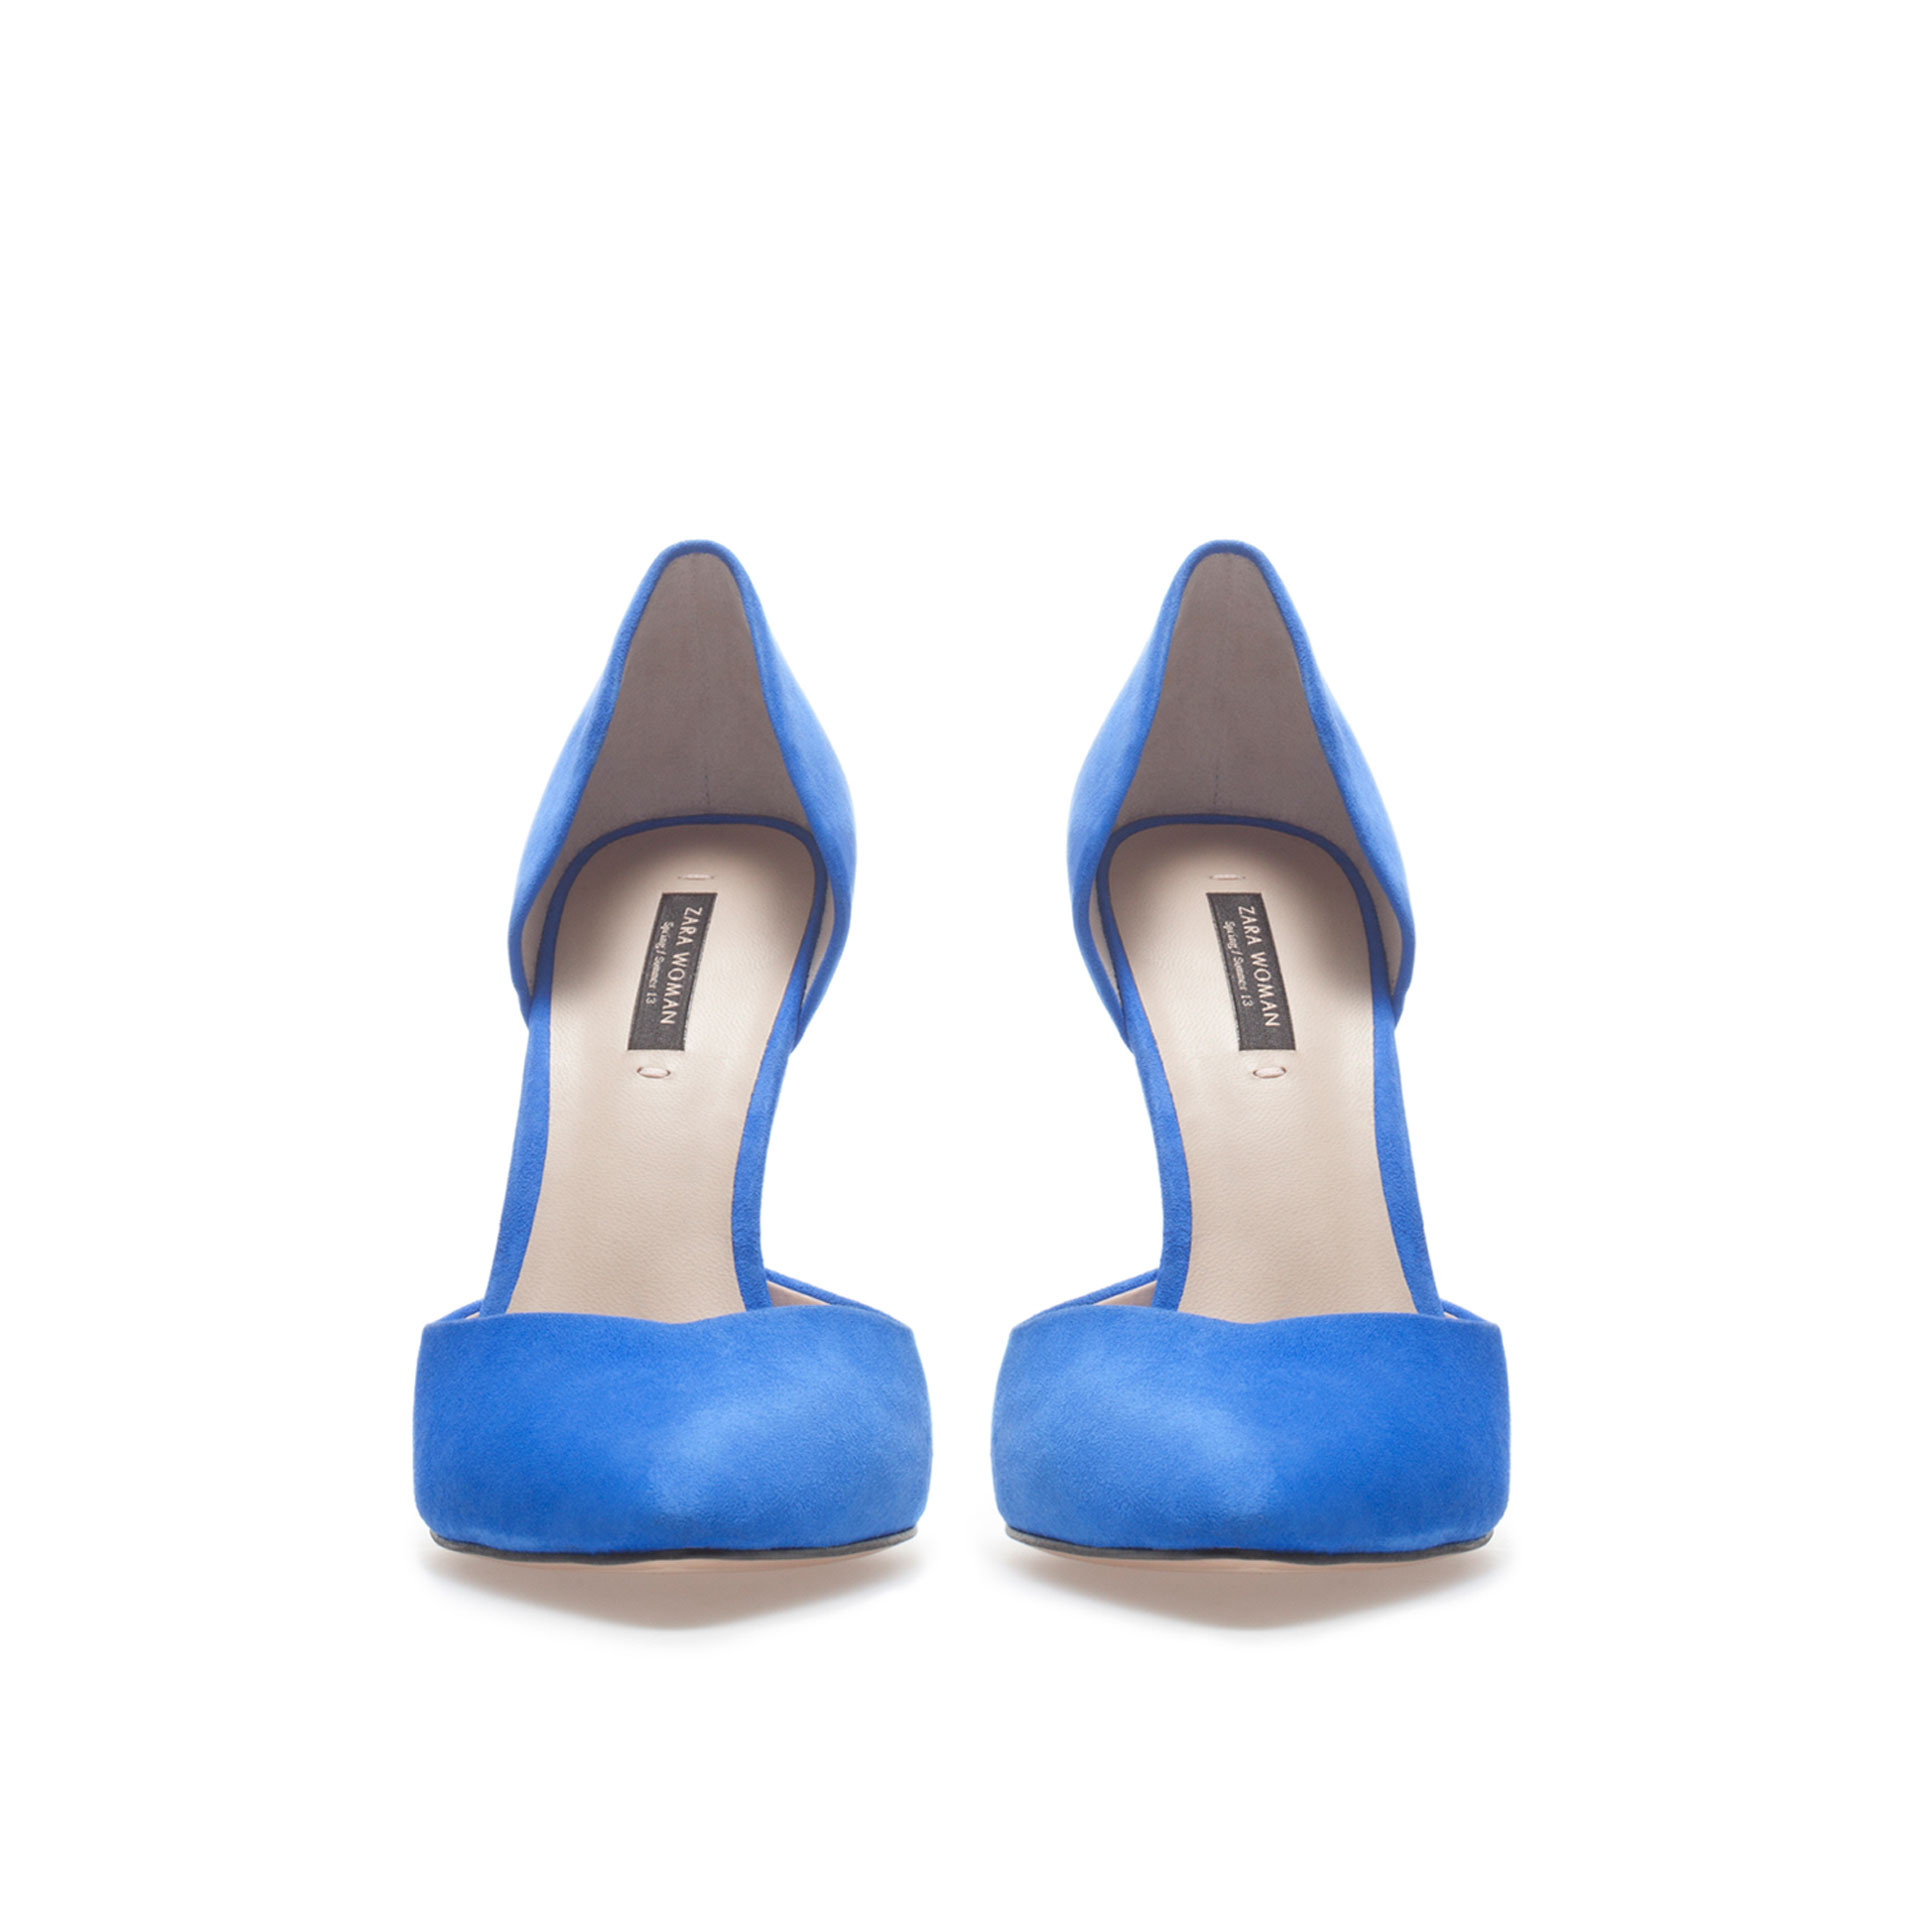 Electric Blue High Heels